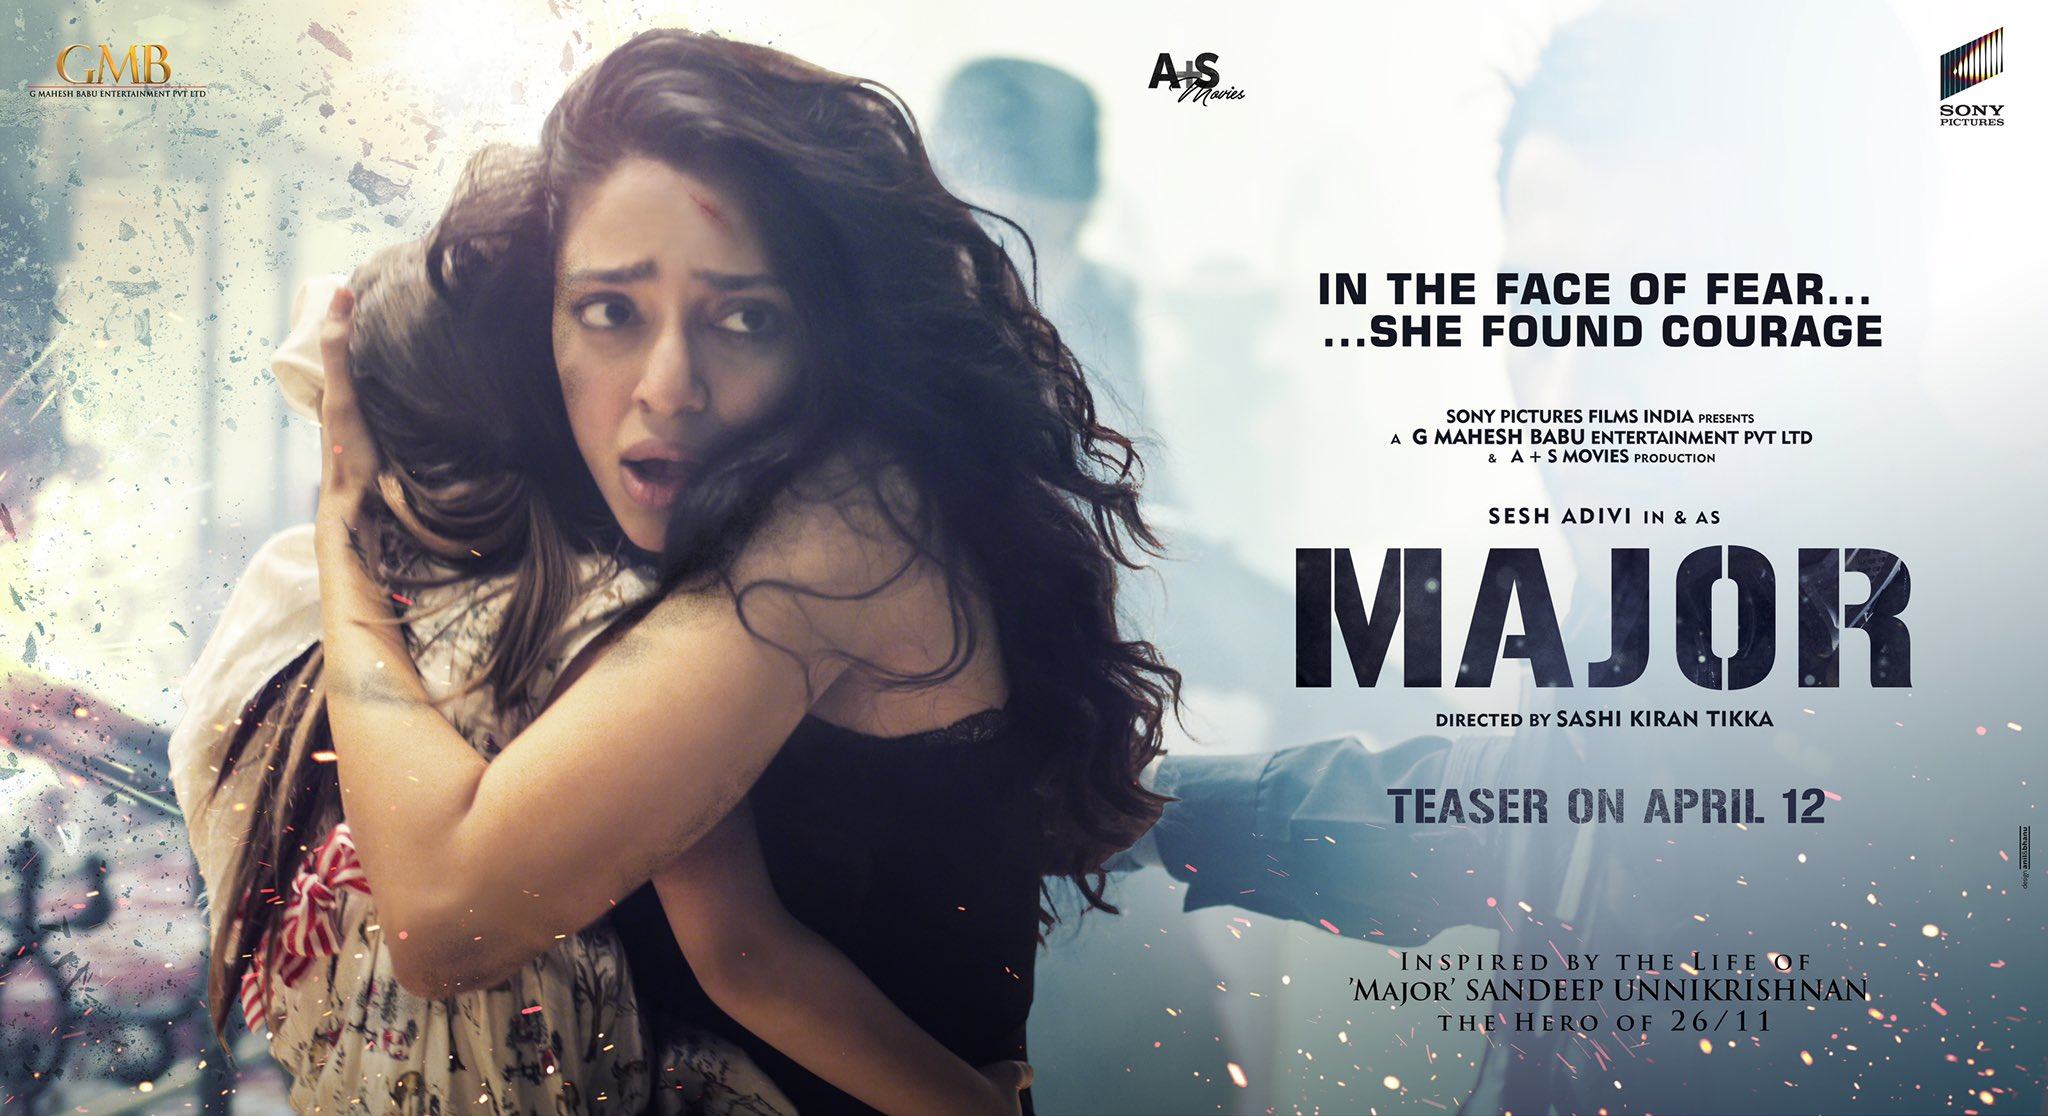 Actress Sobhita Dhulipala Major Movie Posters HD